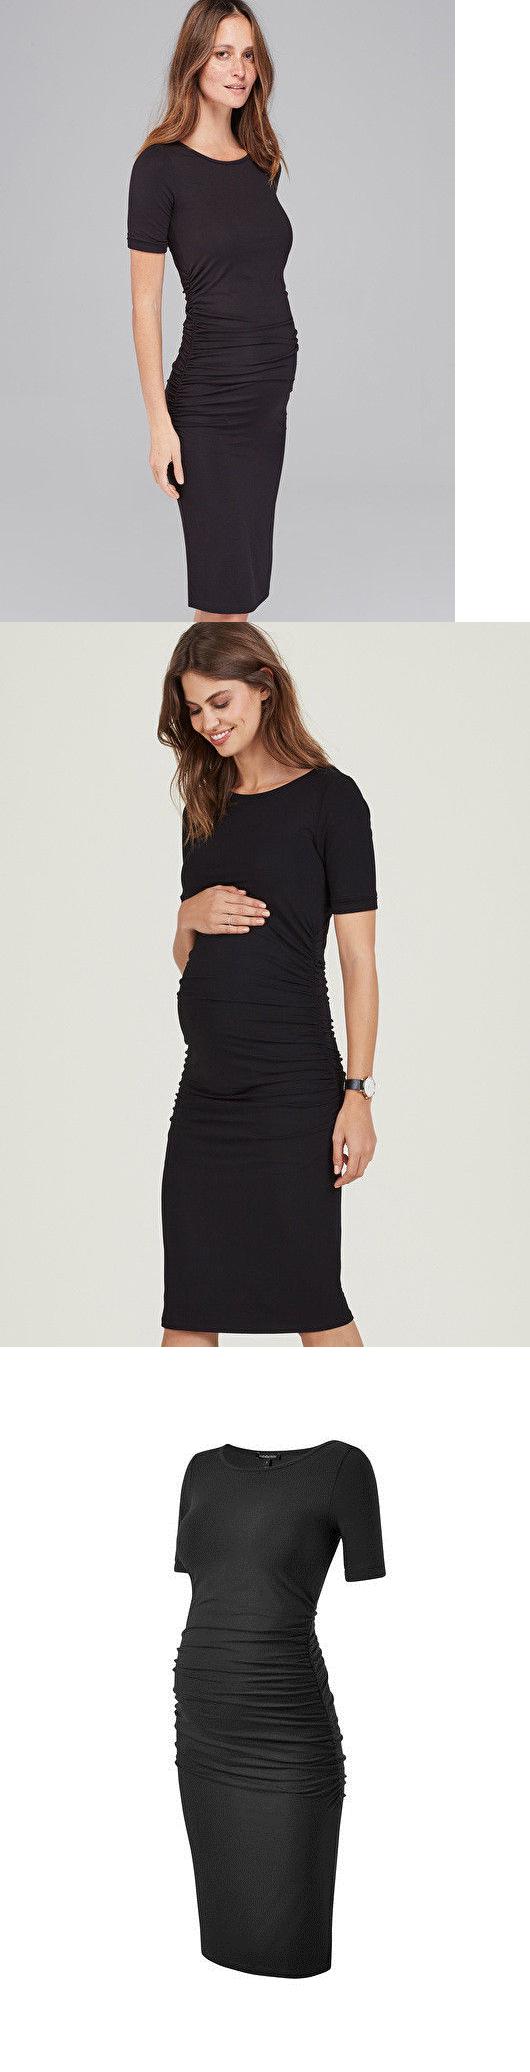 Dresses 11534 new isabella oliver ruched t shirt maternity dress dresses 11534 new isabella oliver ruched t shirt maternity dress in black ombrellifo Images